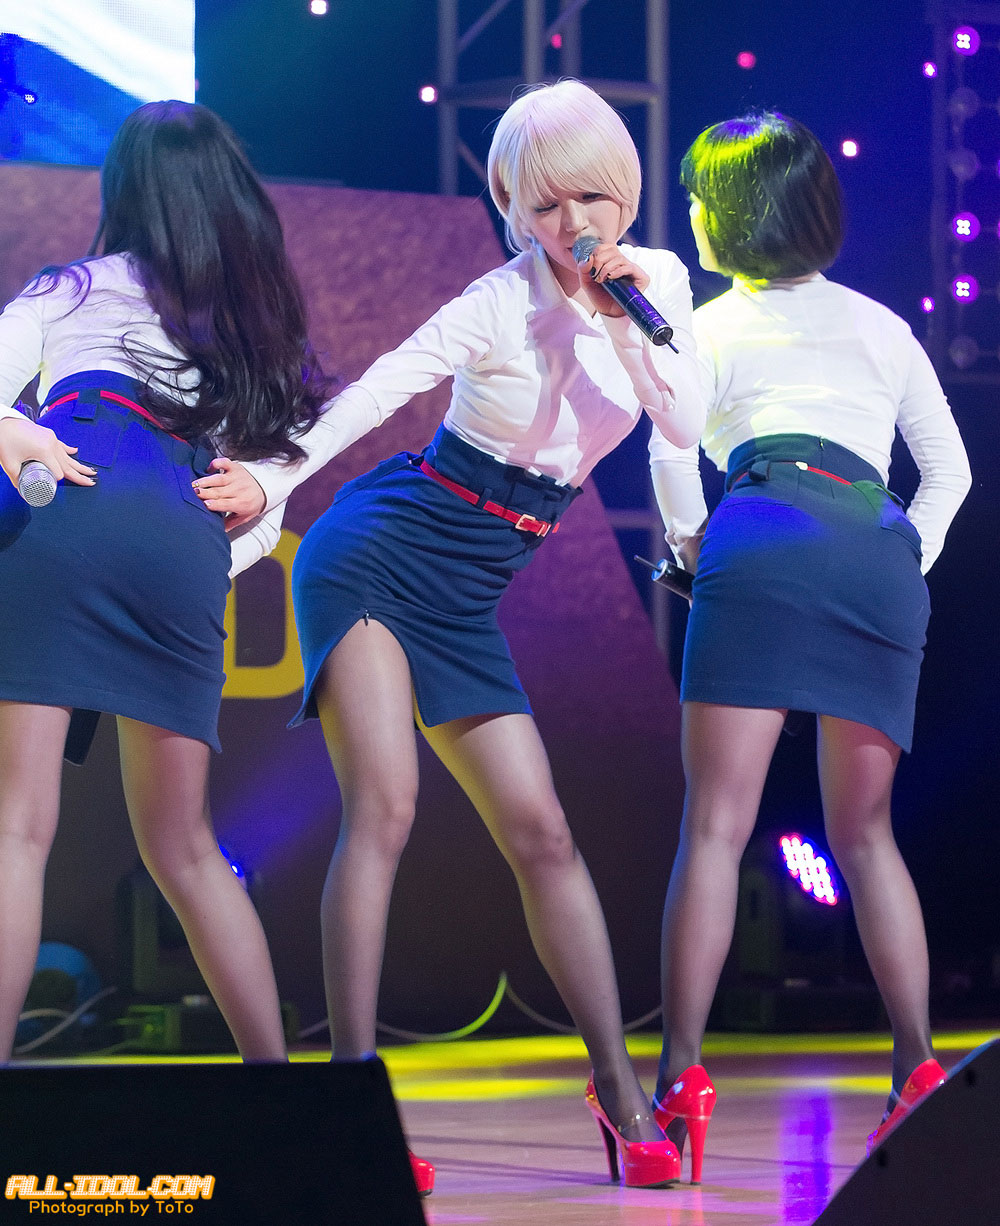 AOA Choa Miniskirt live performance